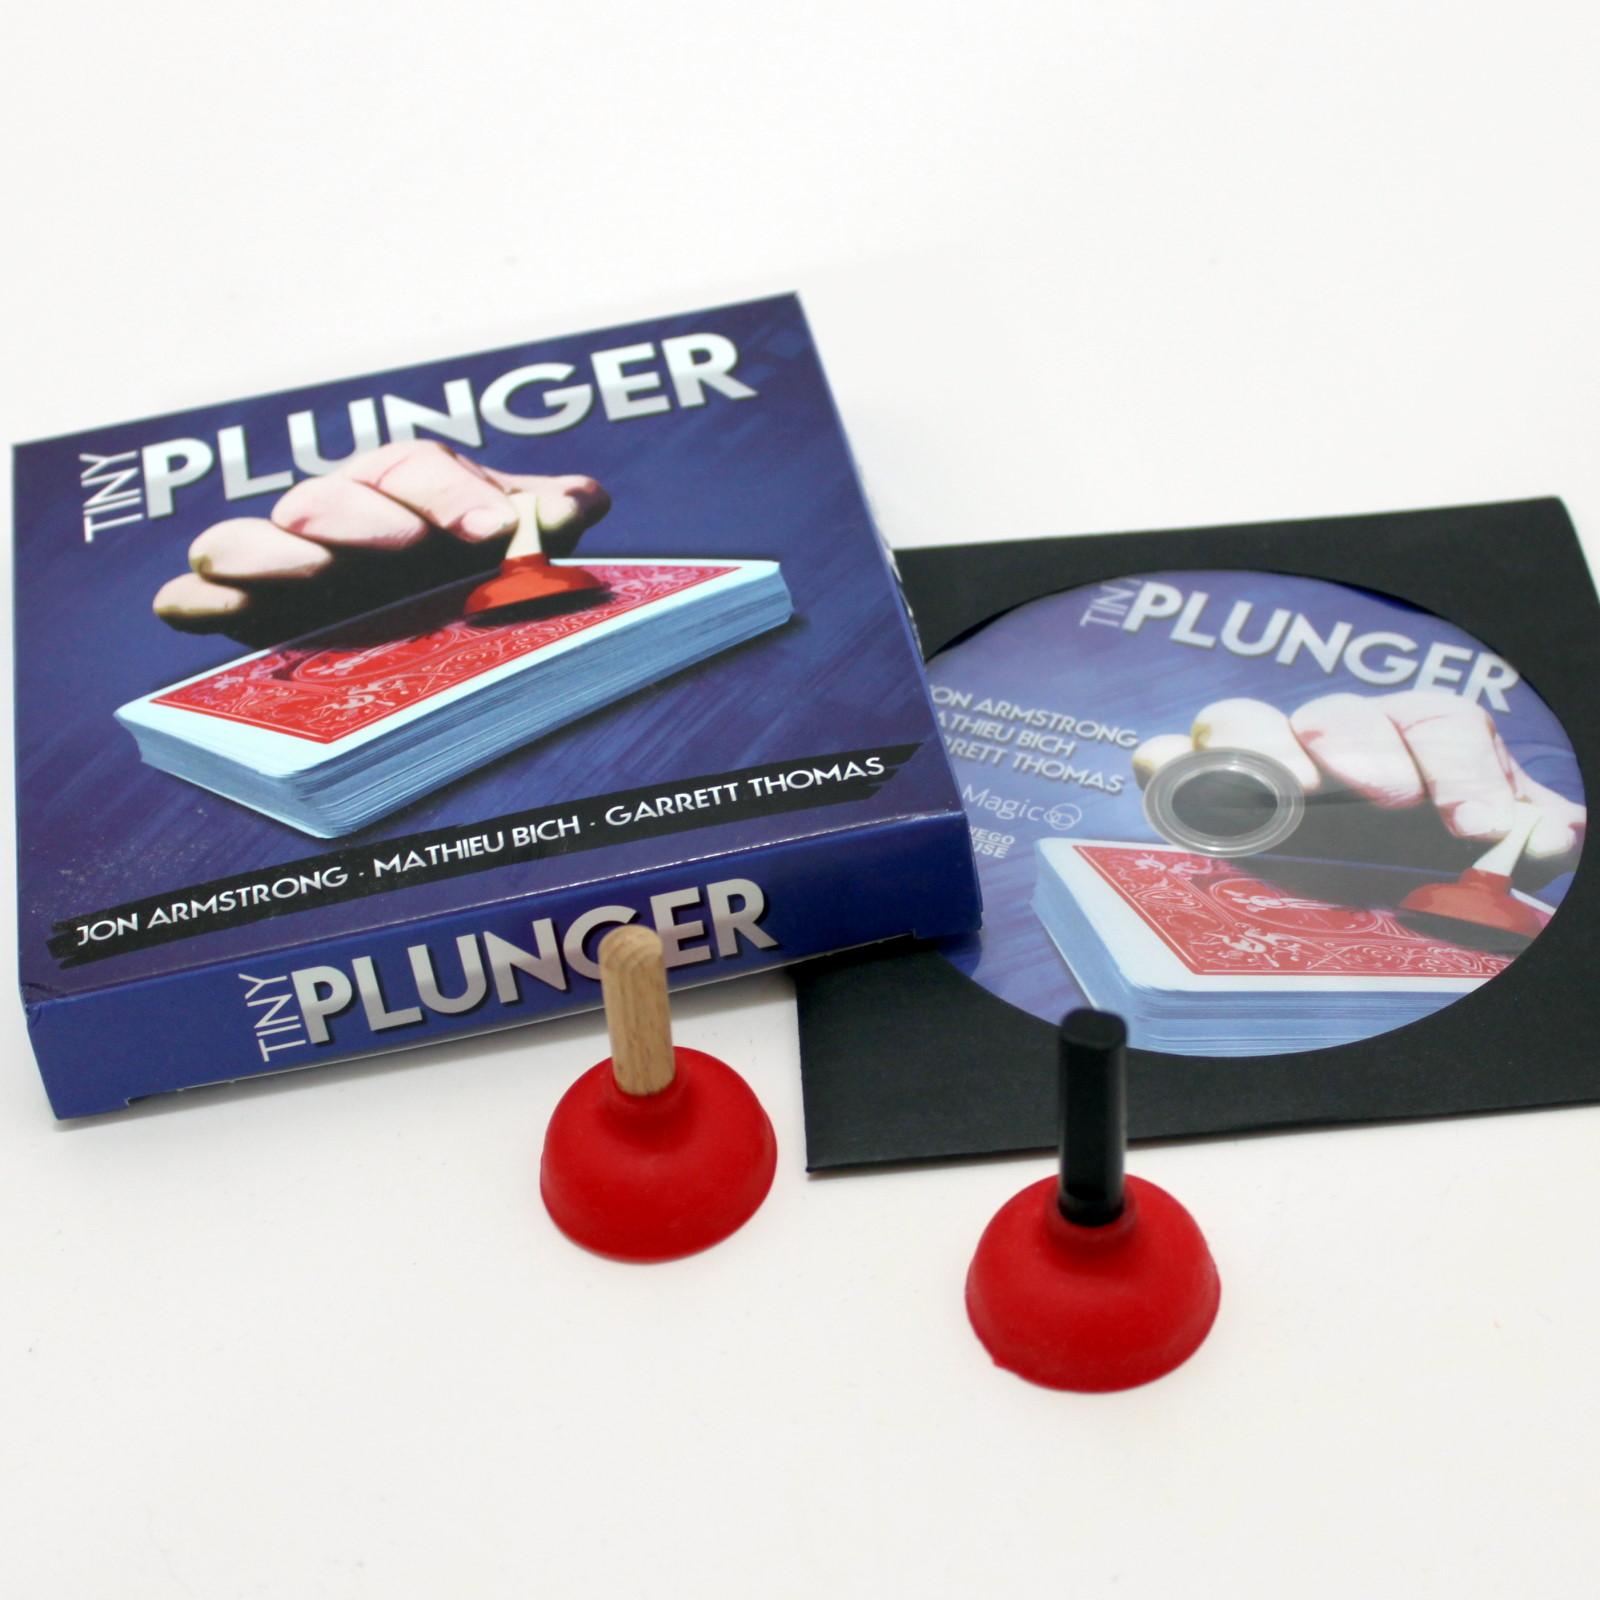 Tiny Plunger by Mathieu Bich, Jon Armstrong, Garrett Thomas